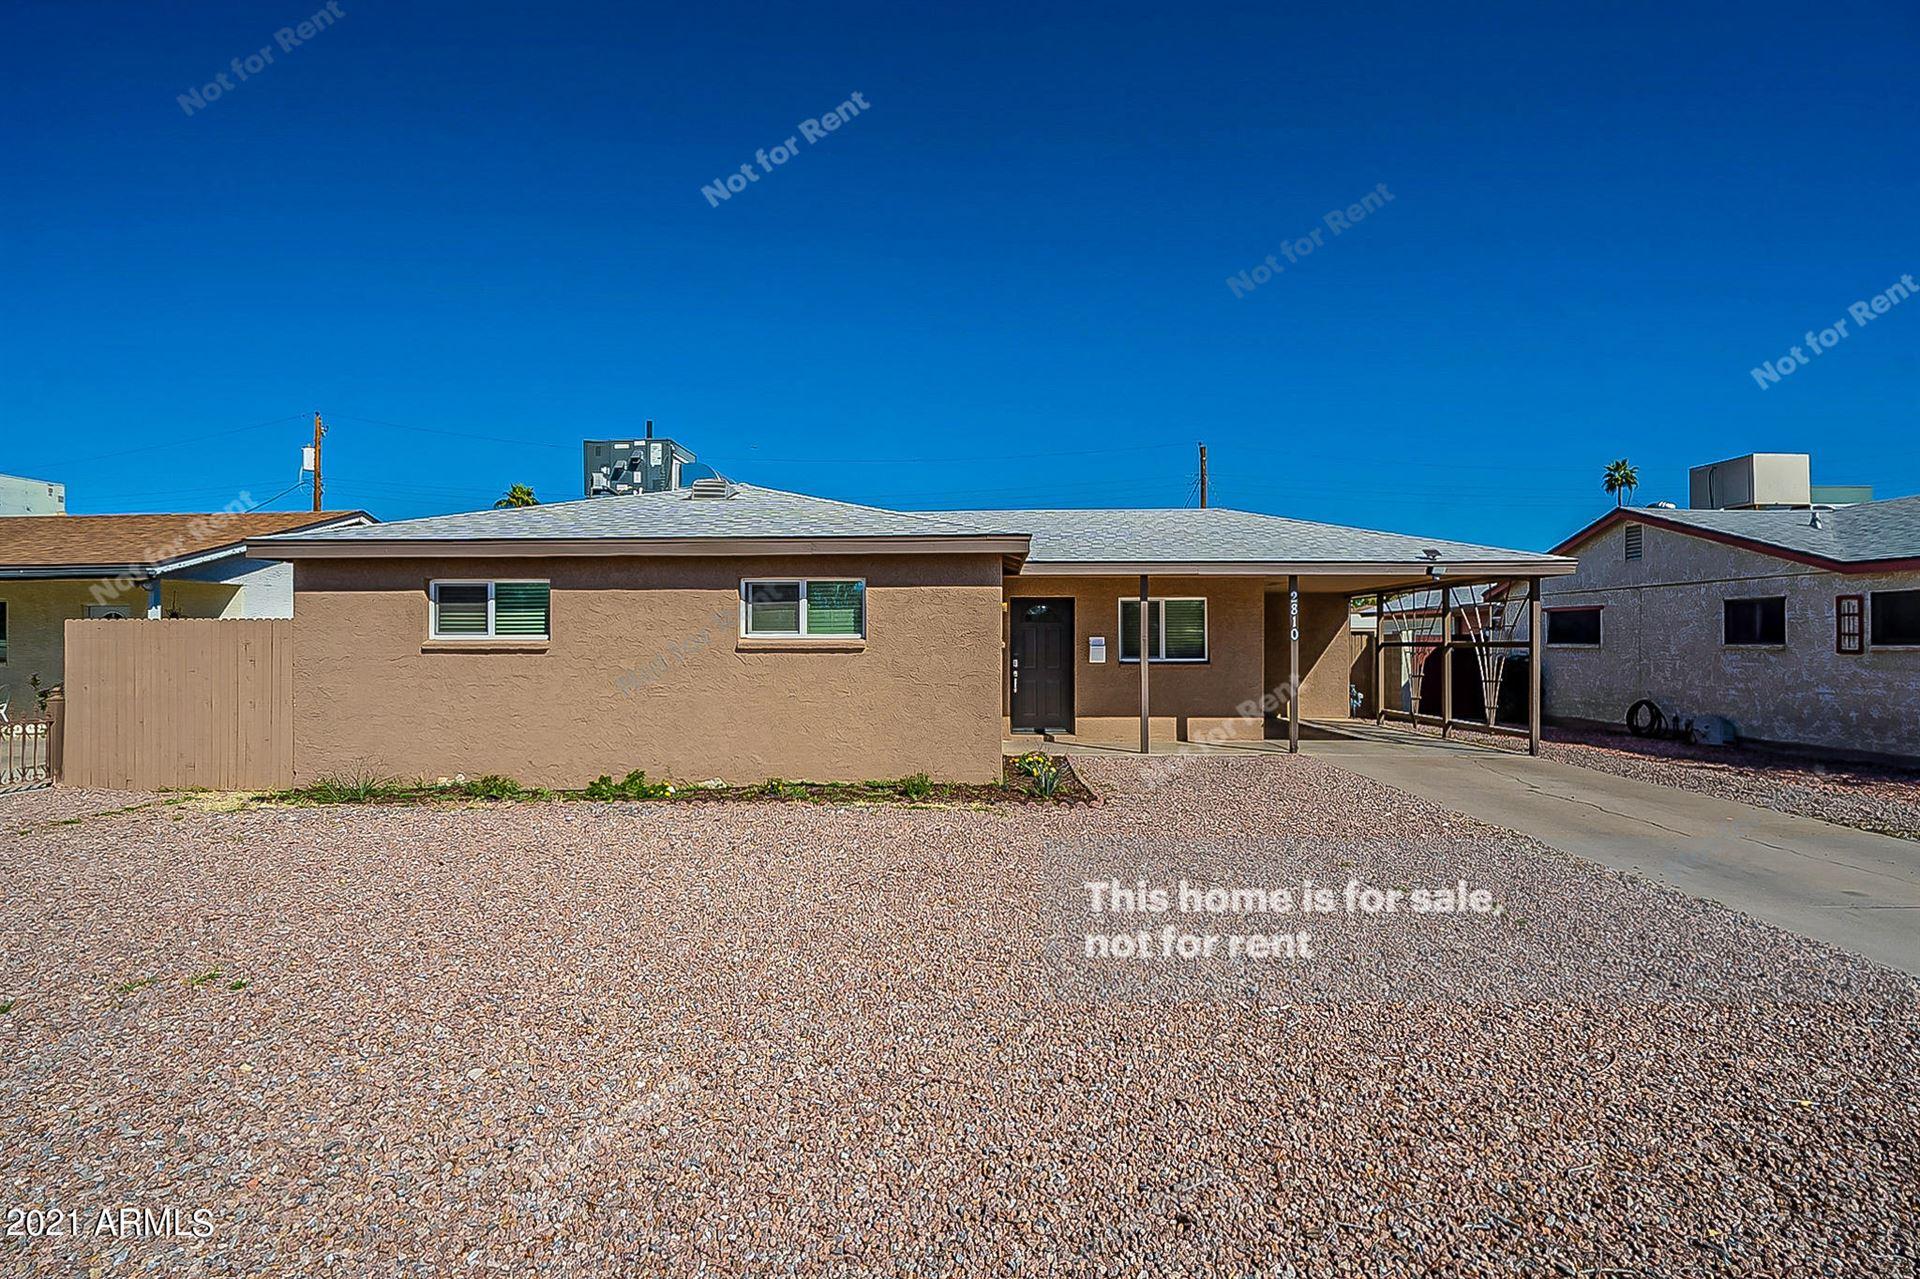 2810 W COOLIDGE Street, Phoenix, AZ 85017 - MLS#: 6198644